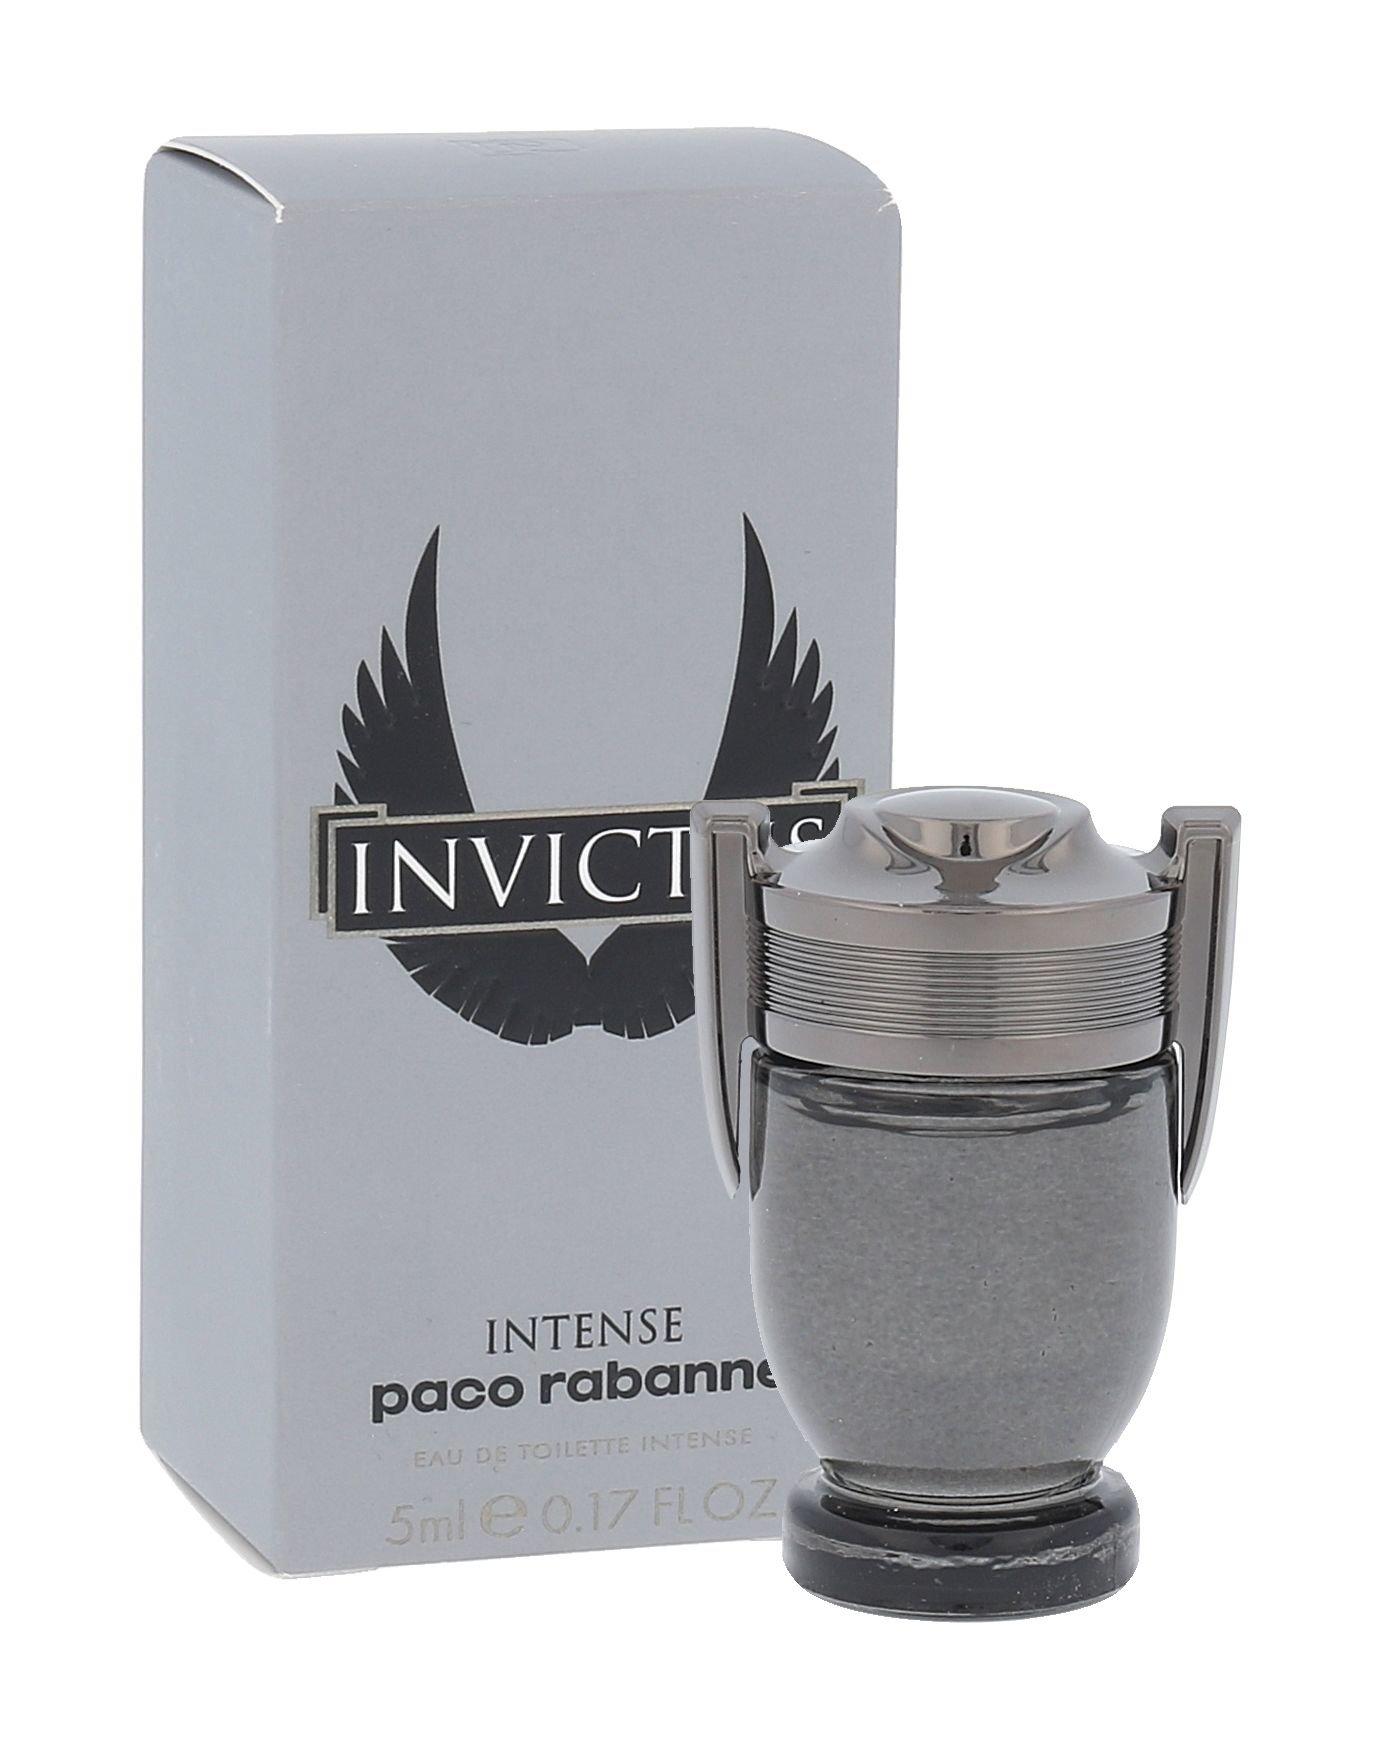 Paco Rabanne Invictus Intense EDT 5ml